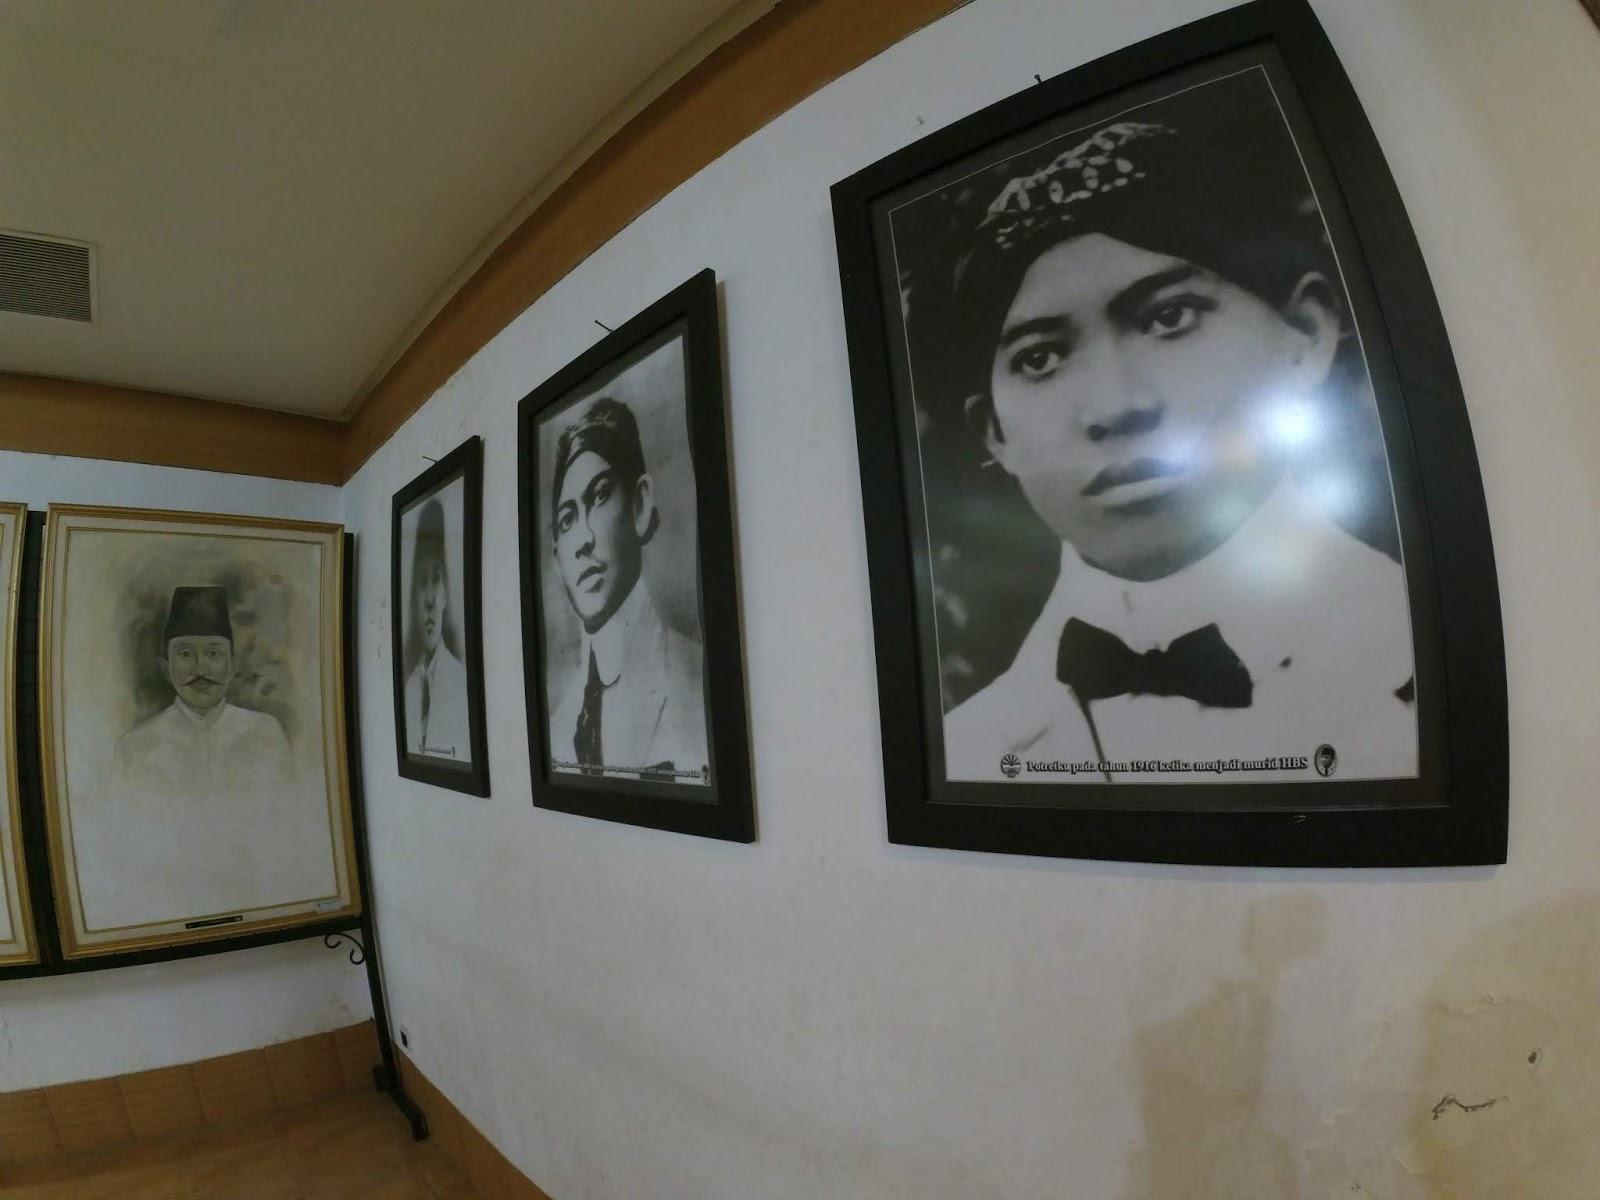 Blitar tourism, First President of Indonesia, Founding father of Indonesia, diarynesia